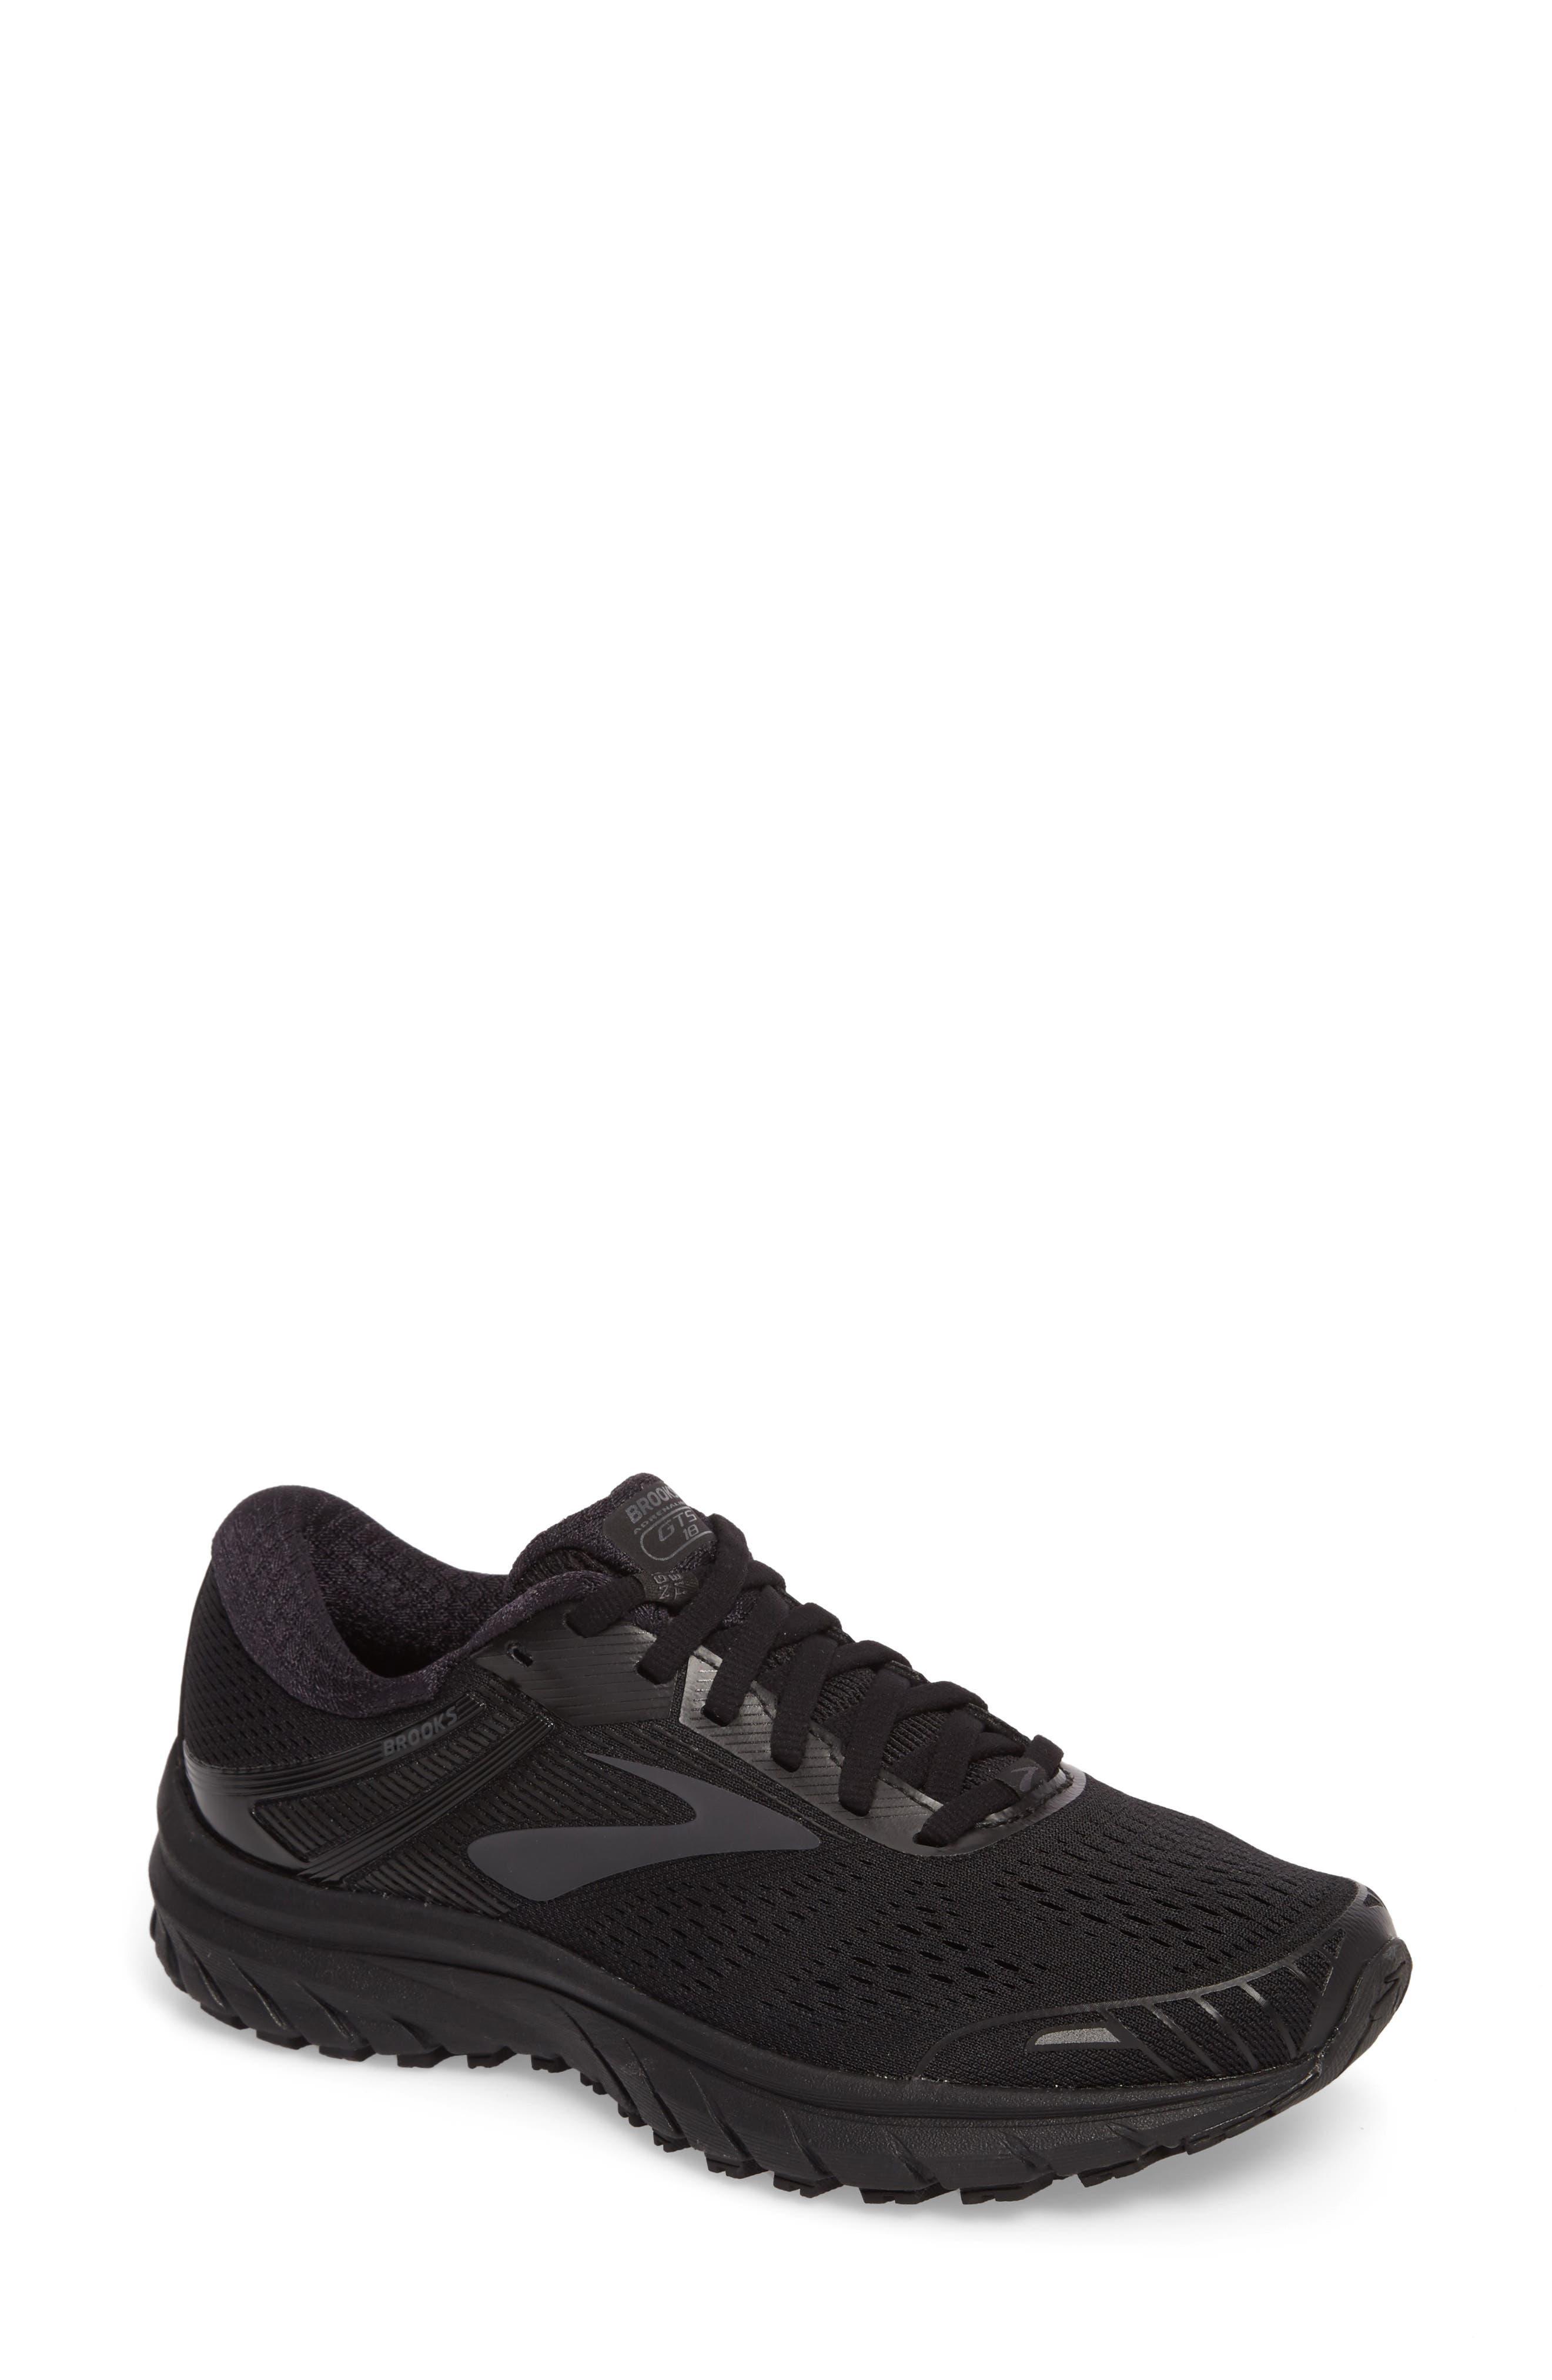 Adrenaline GTS 18 Running Shoe,                         Main,                         color, BLACK/ BLACK